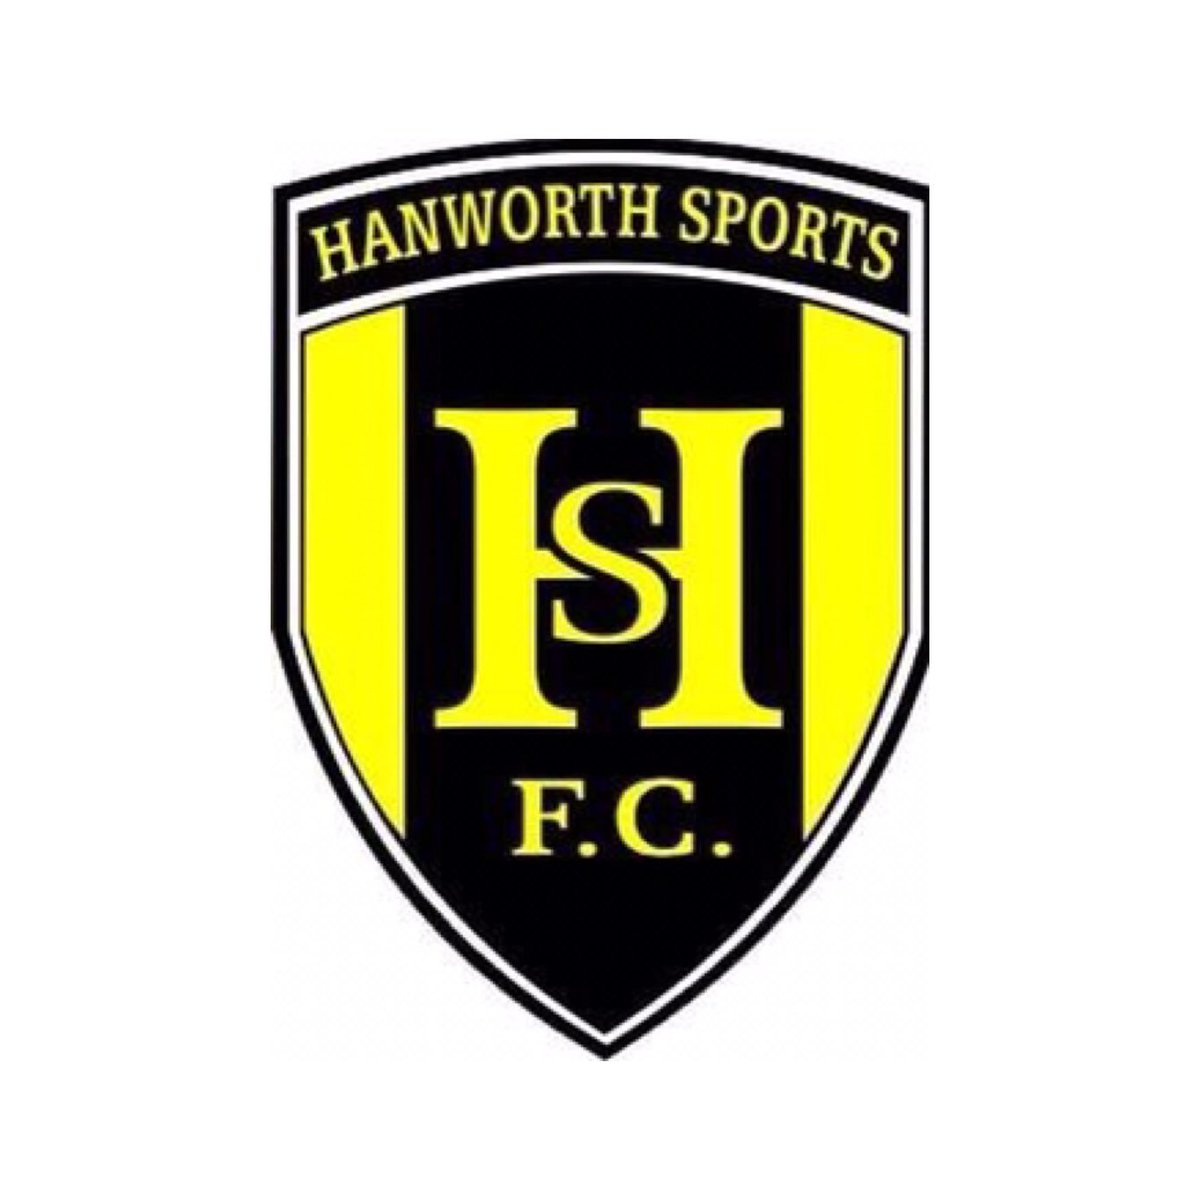 Chris whittart on twitter hanworth sports expect to be quiet on chris whittart on twitter hanworth sports expect to be quiet on deadlineday hanworthsports buycottarizona